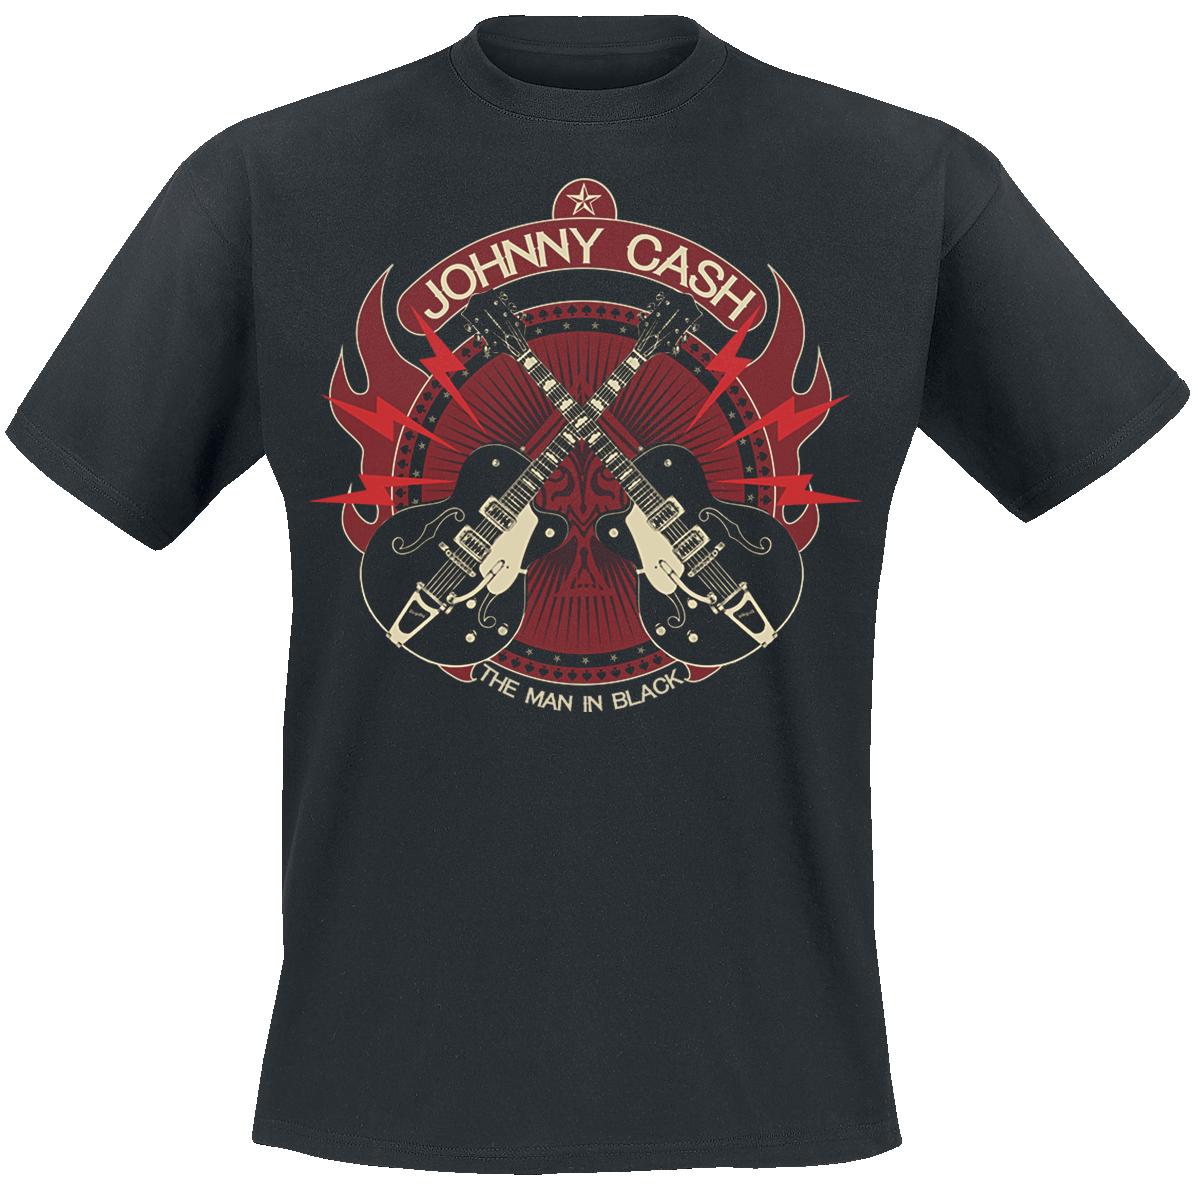 Johnny Cash - Crossed Guitars - T-Shirt - black image